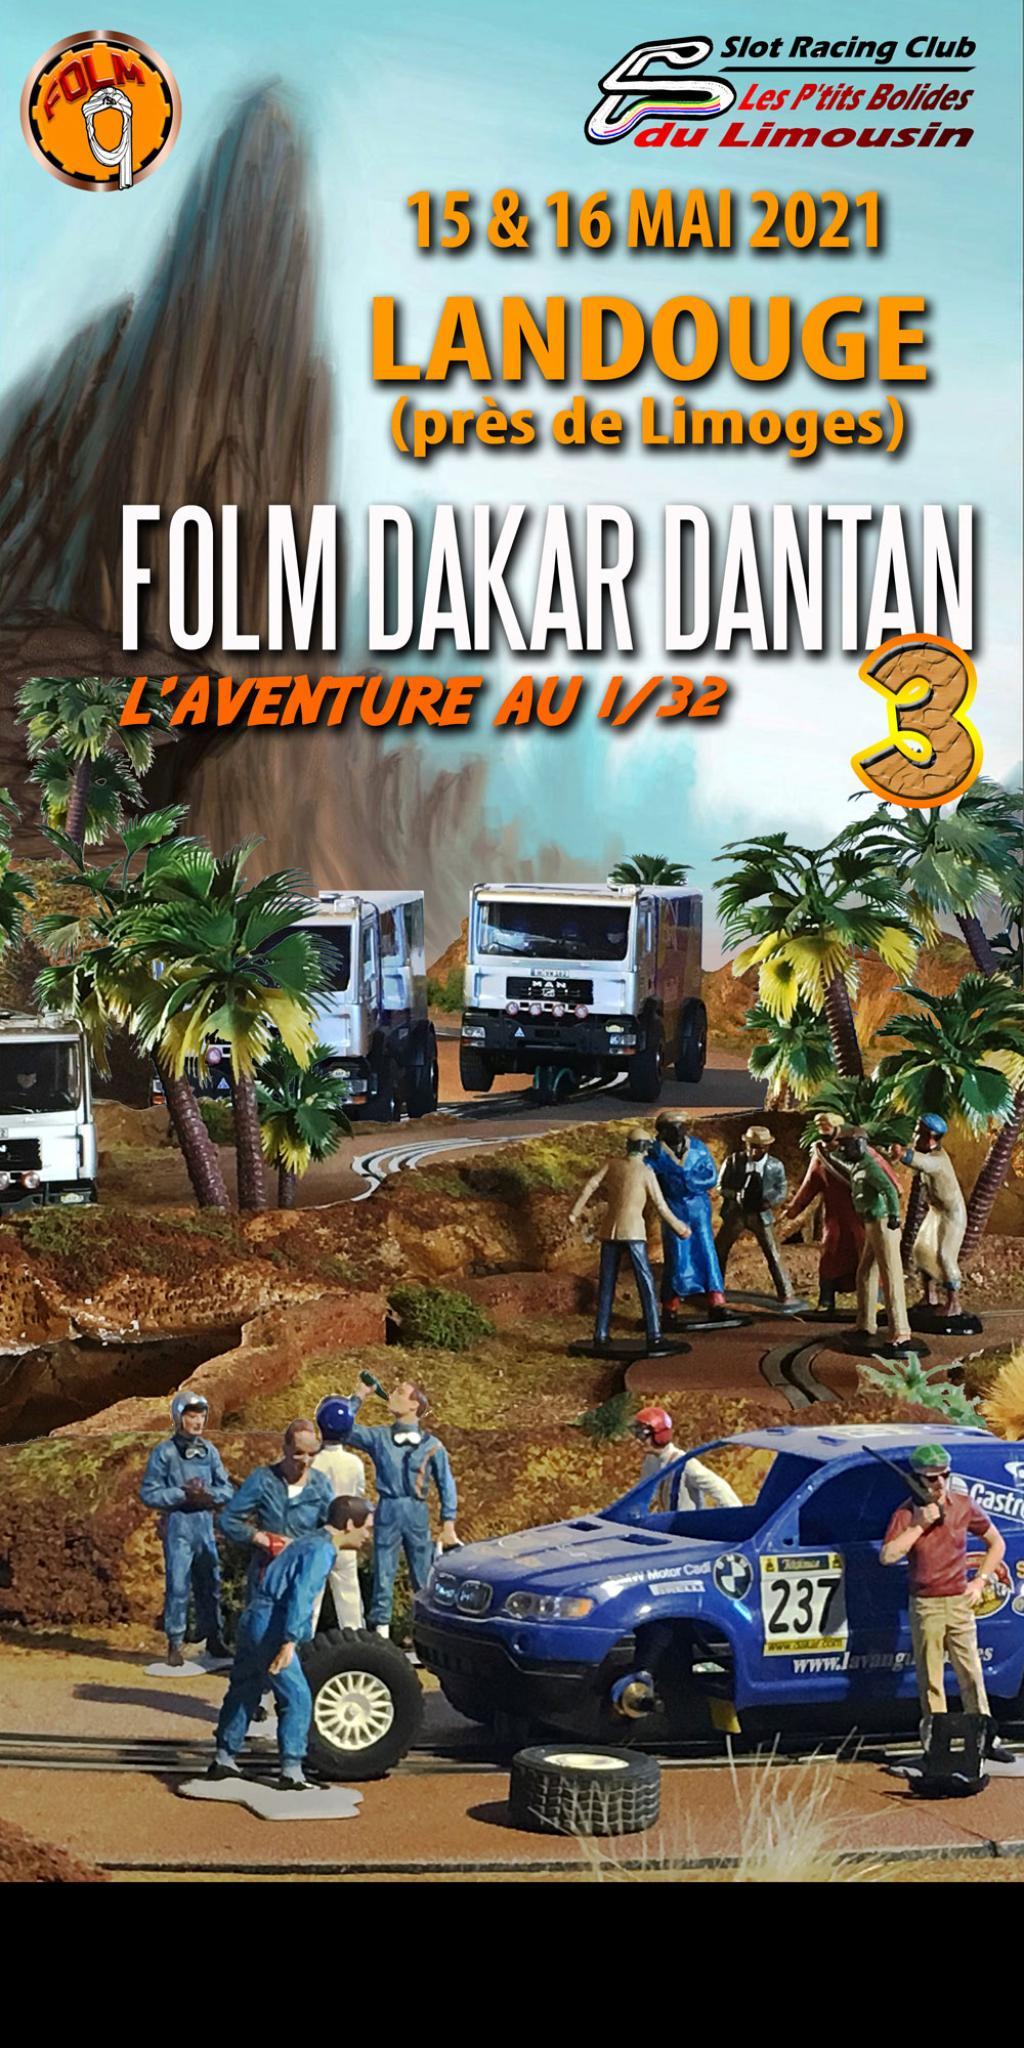 FOLM DAKAR DANTAN 3 Affiche-1000-web-57c7c23